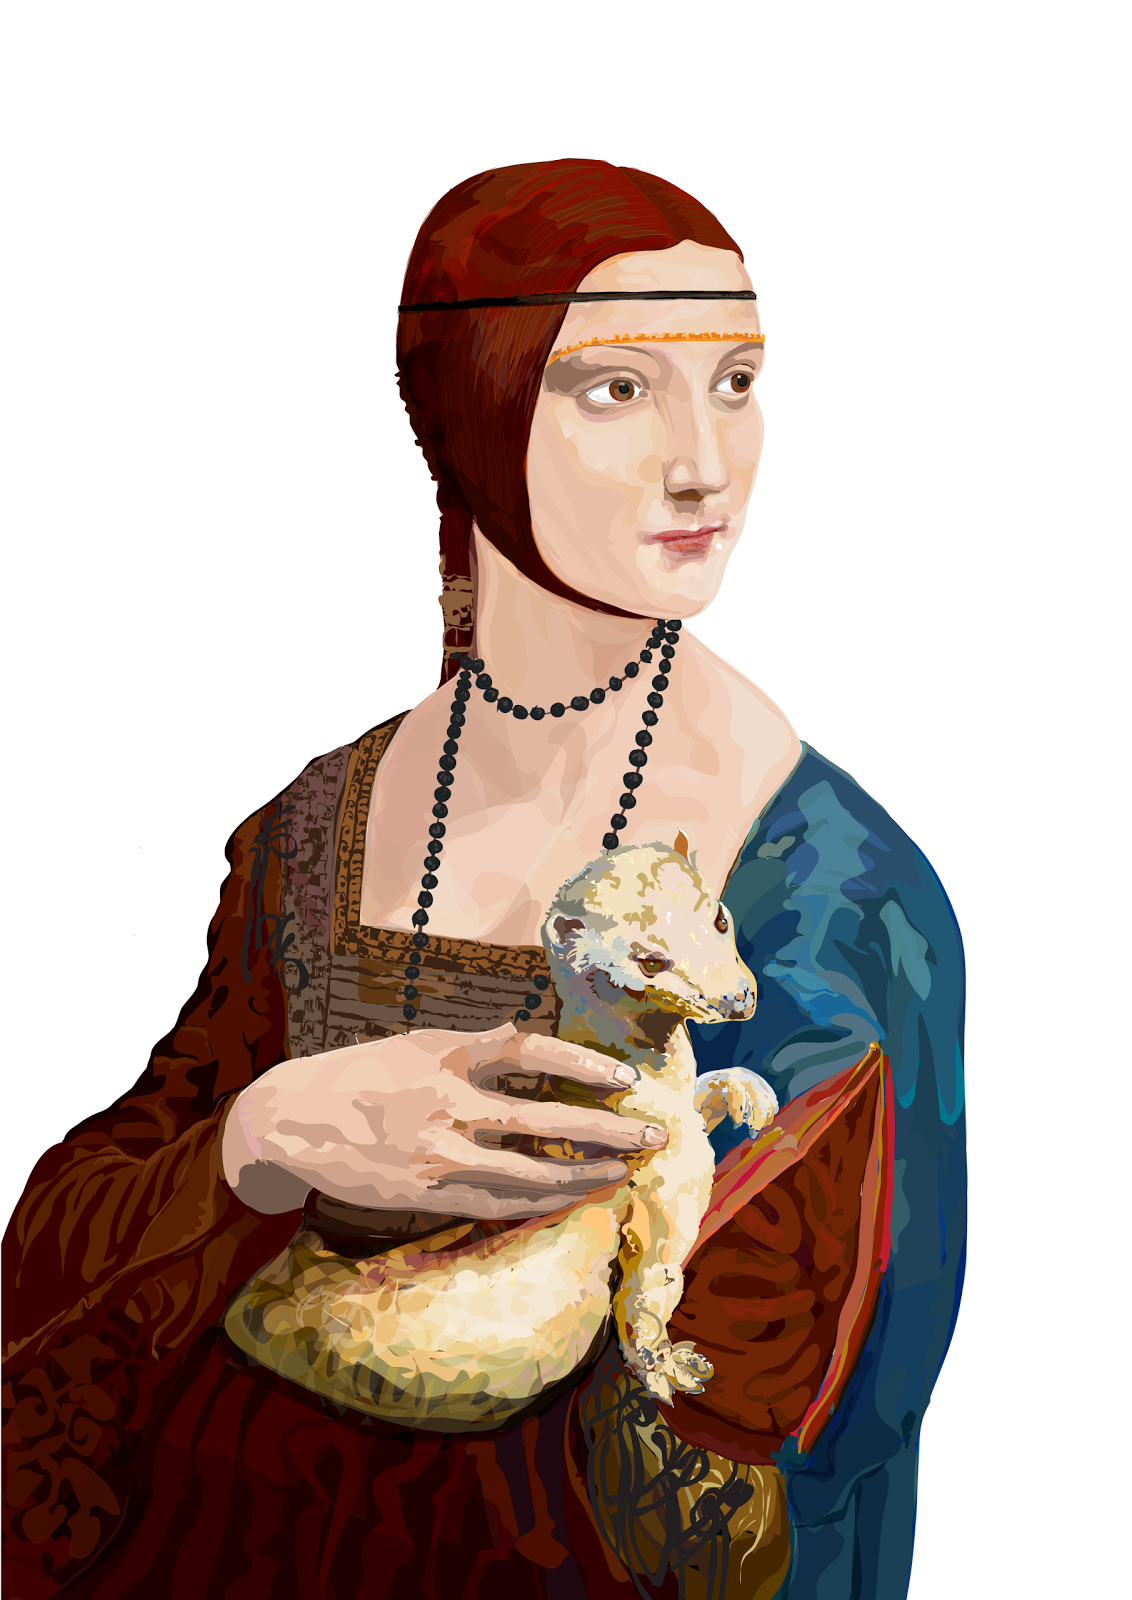 Da vinci lady with an ermine 90x120cm lady with an ermine based on da